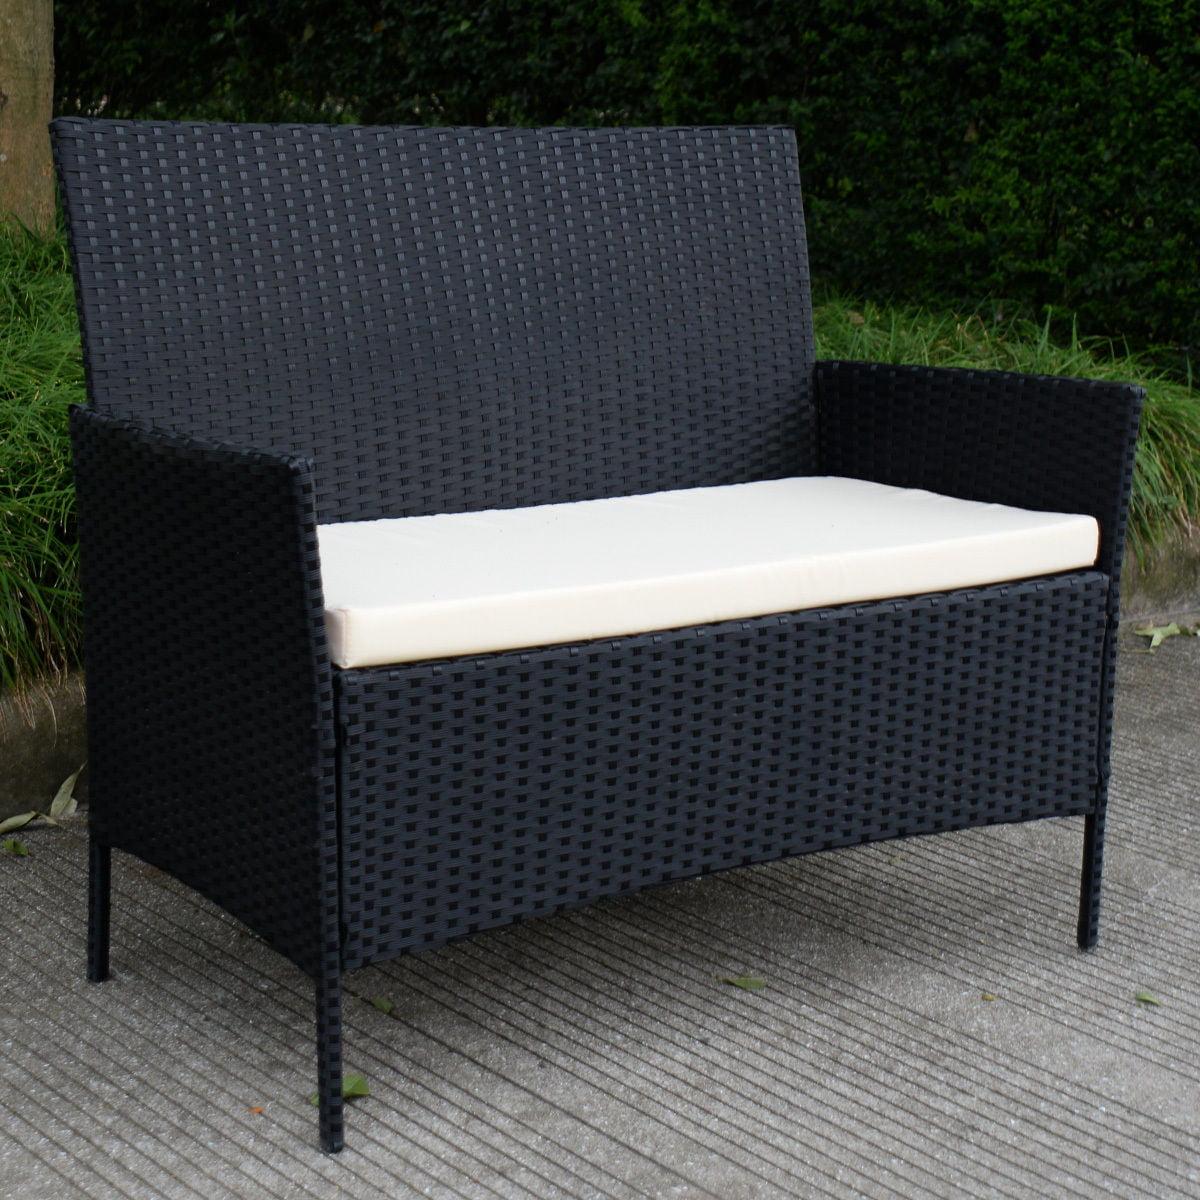 4pcs Patio Rattan Sofa Set Loveseat Cushioned Furniture Outdoor Garden - image 8 of 9